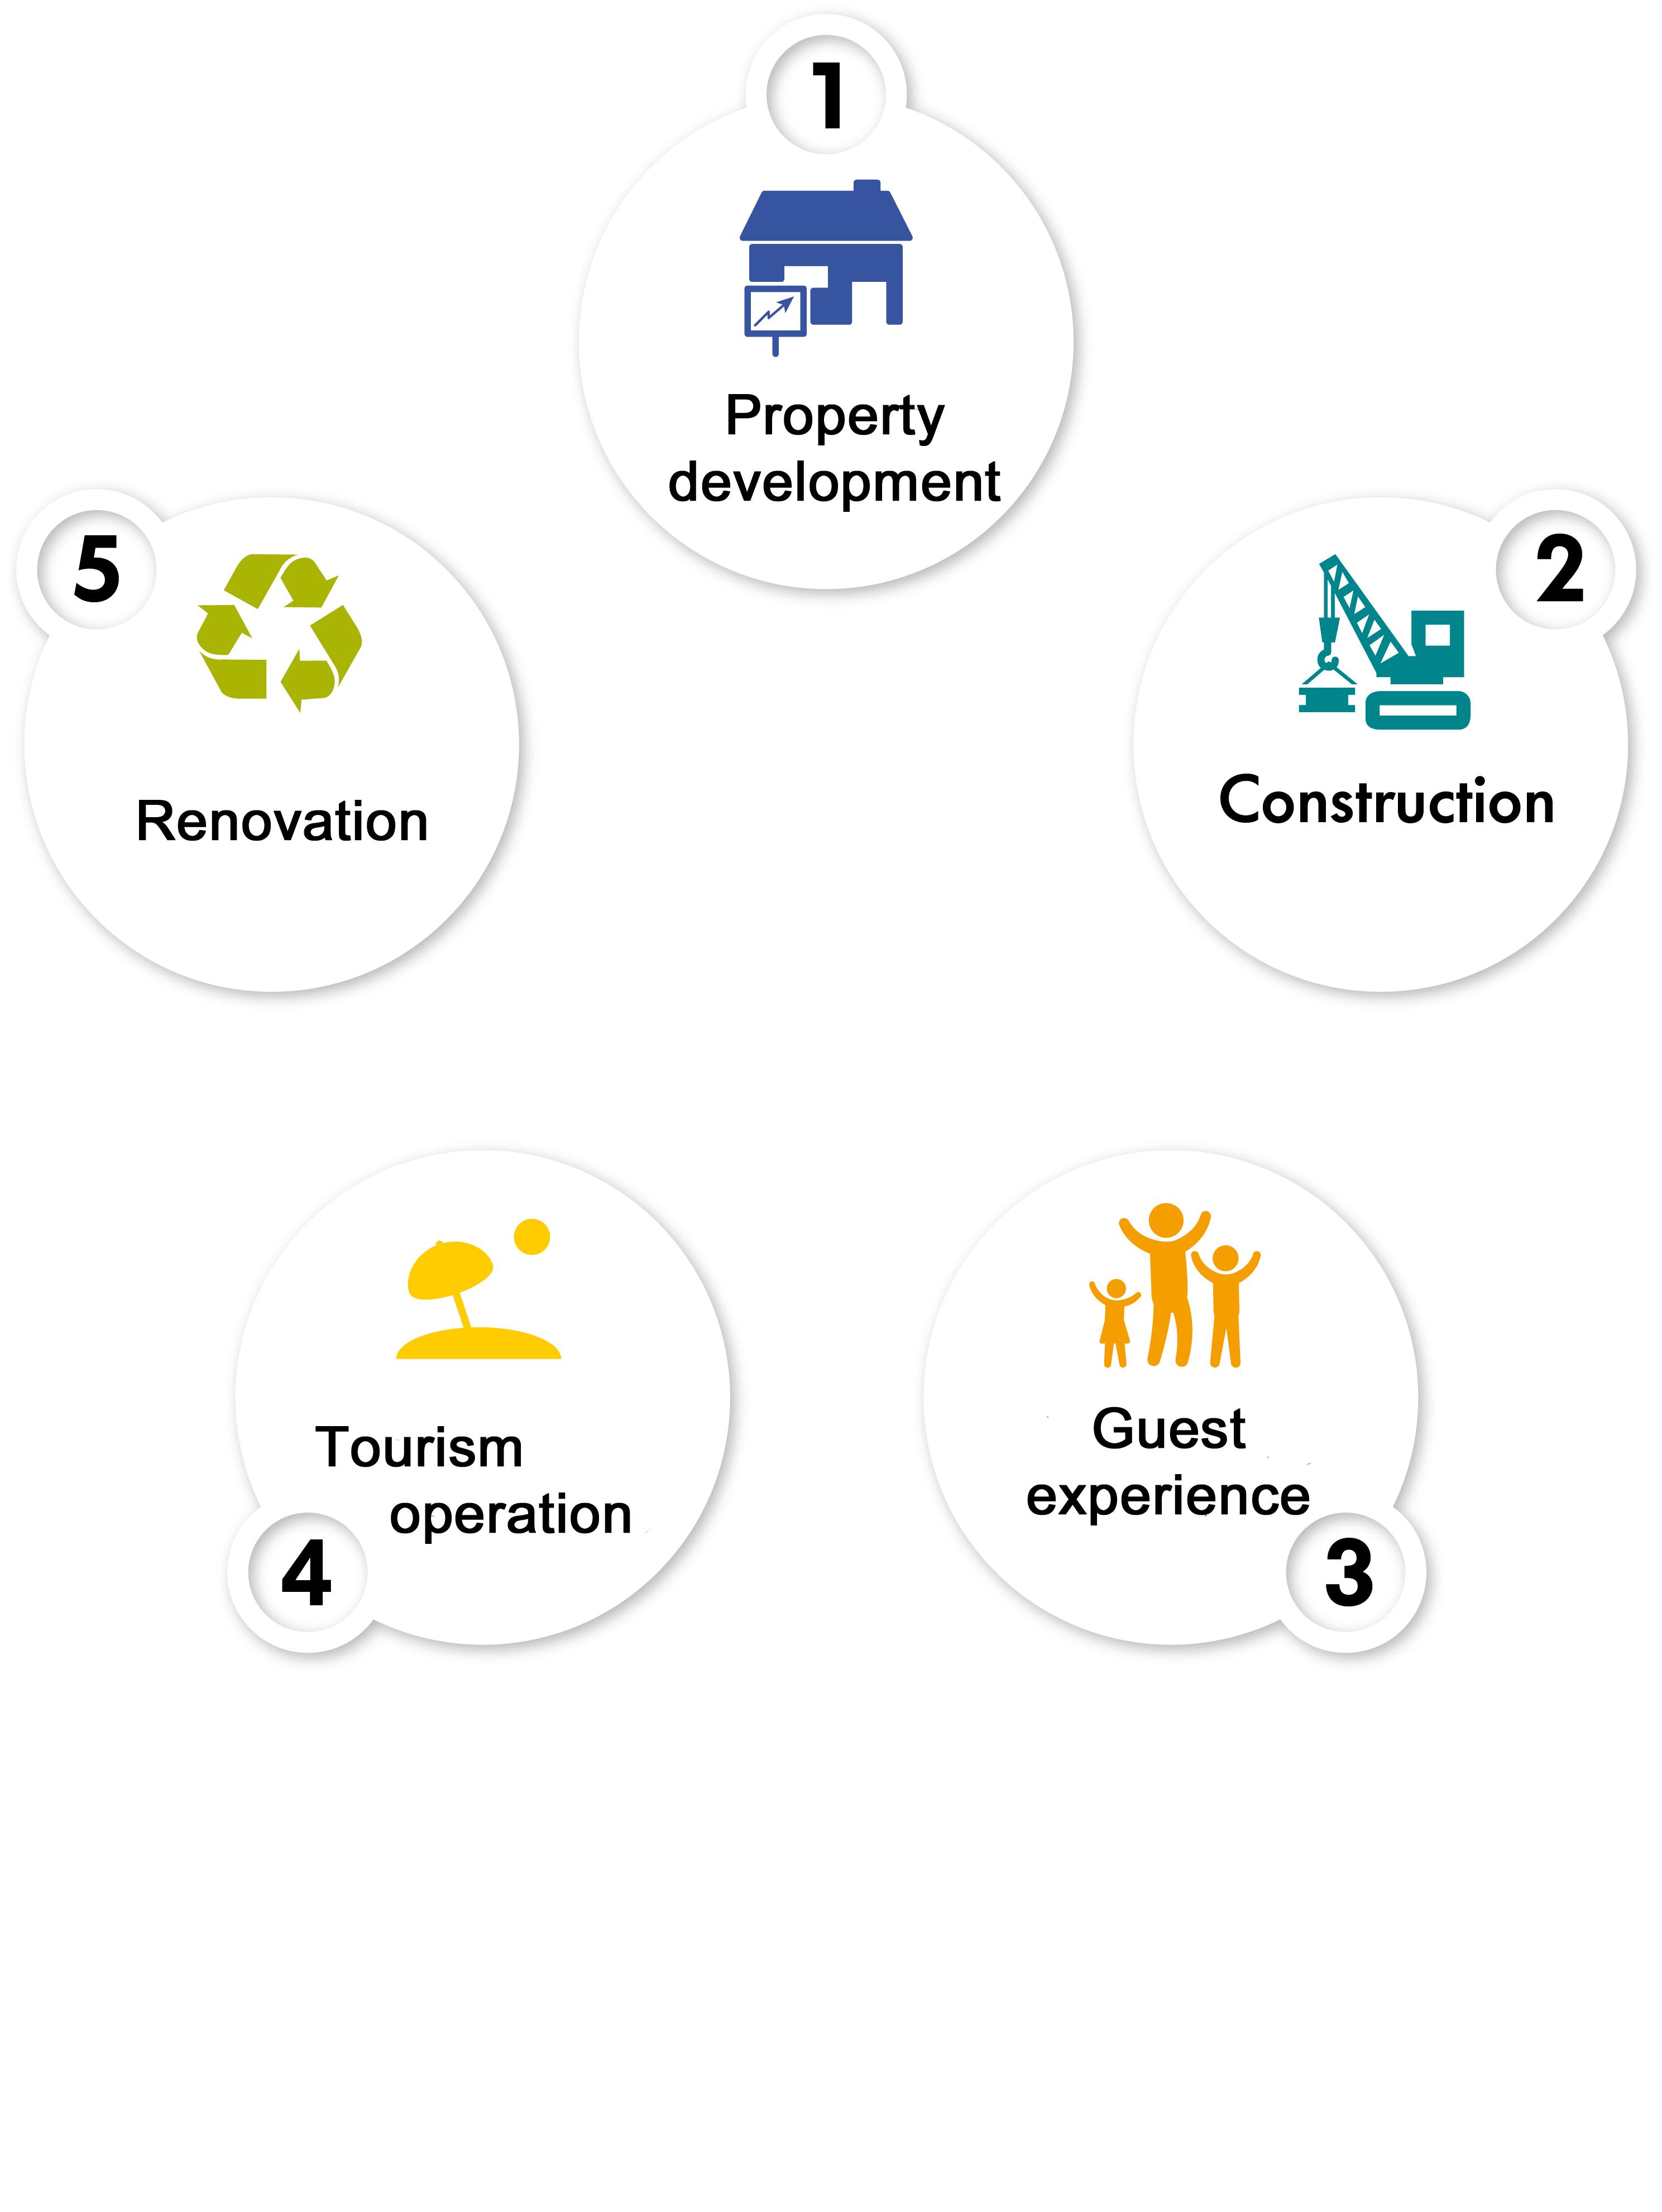 Duurzame ontwikkeling centraal in beroepen